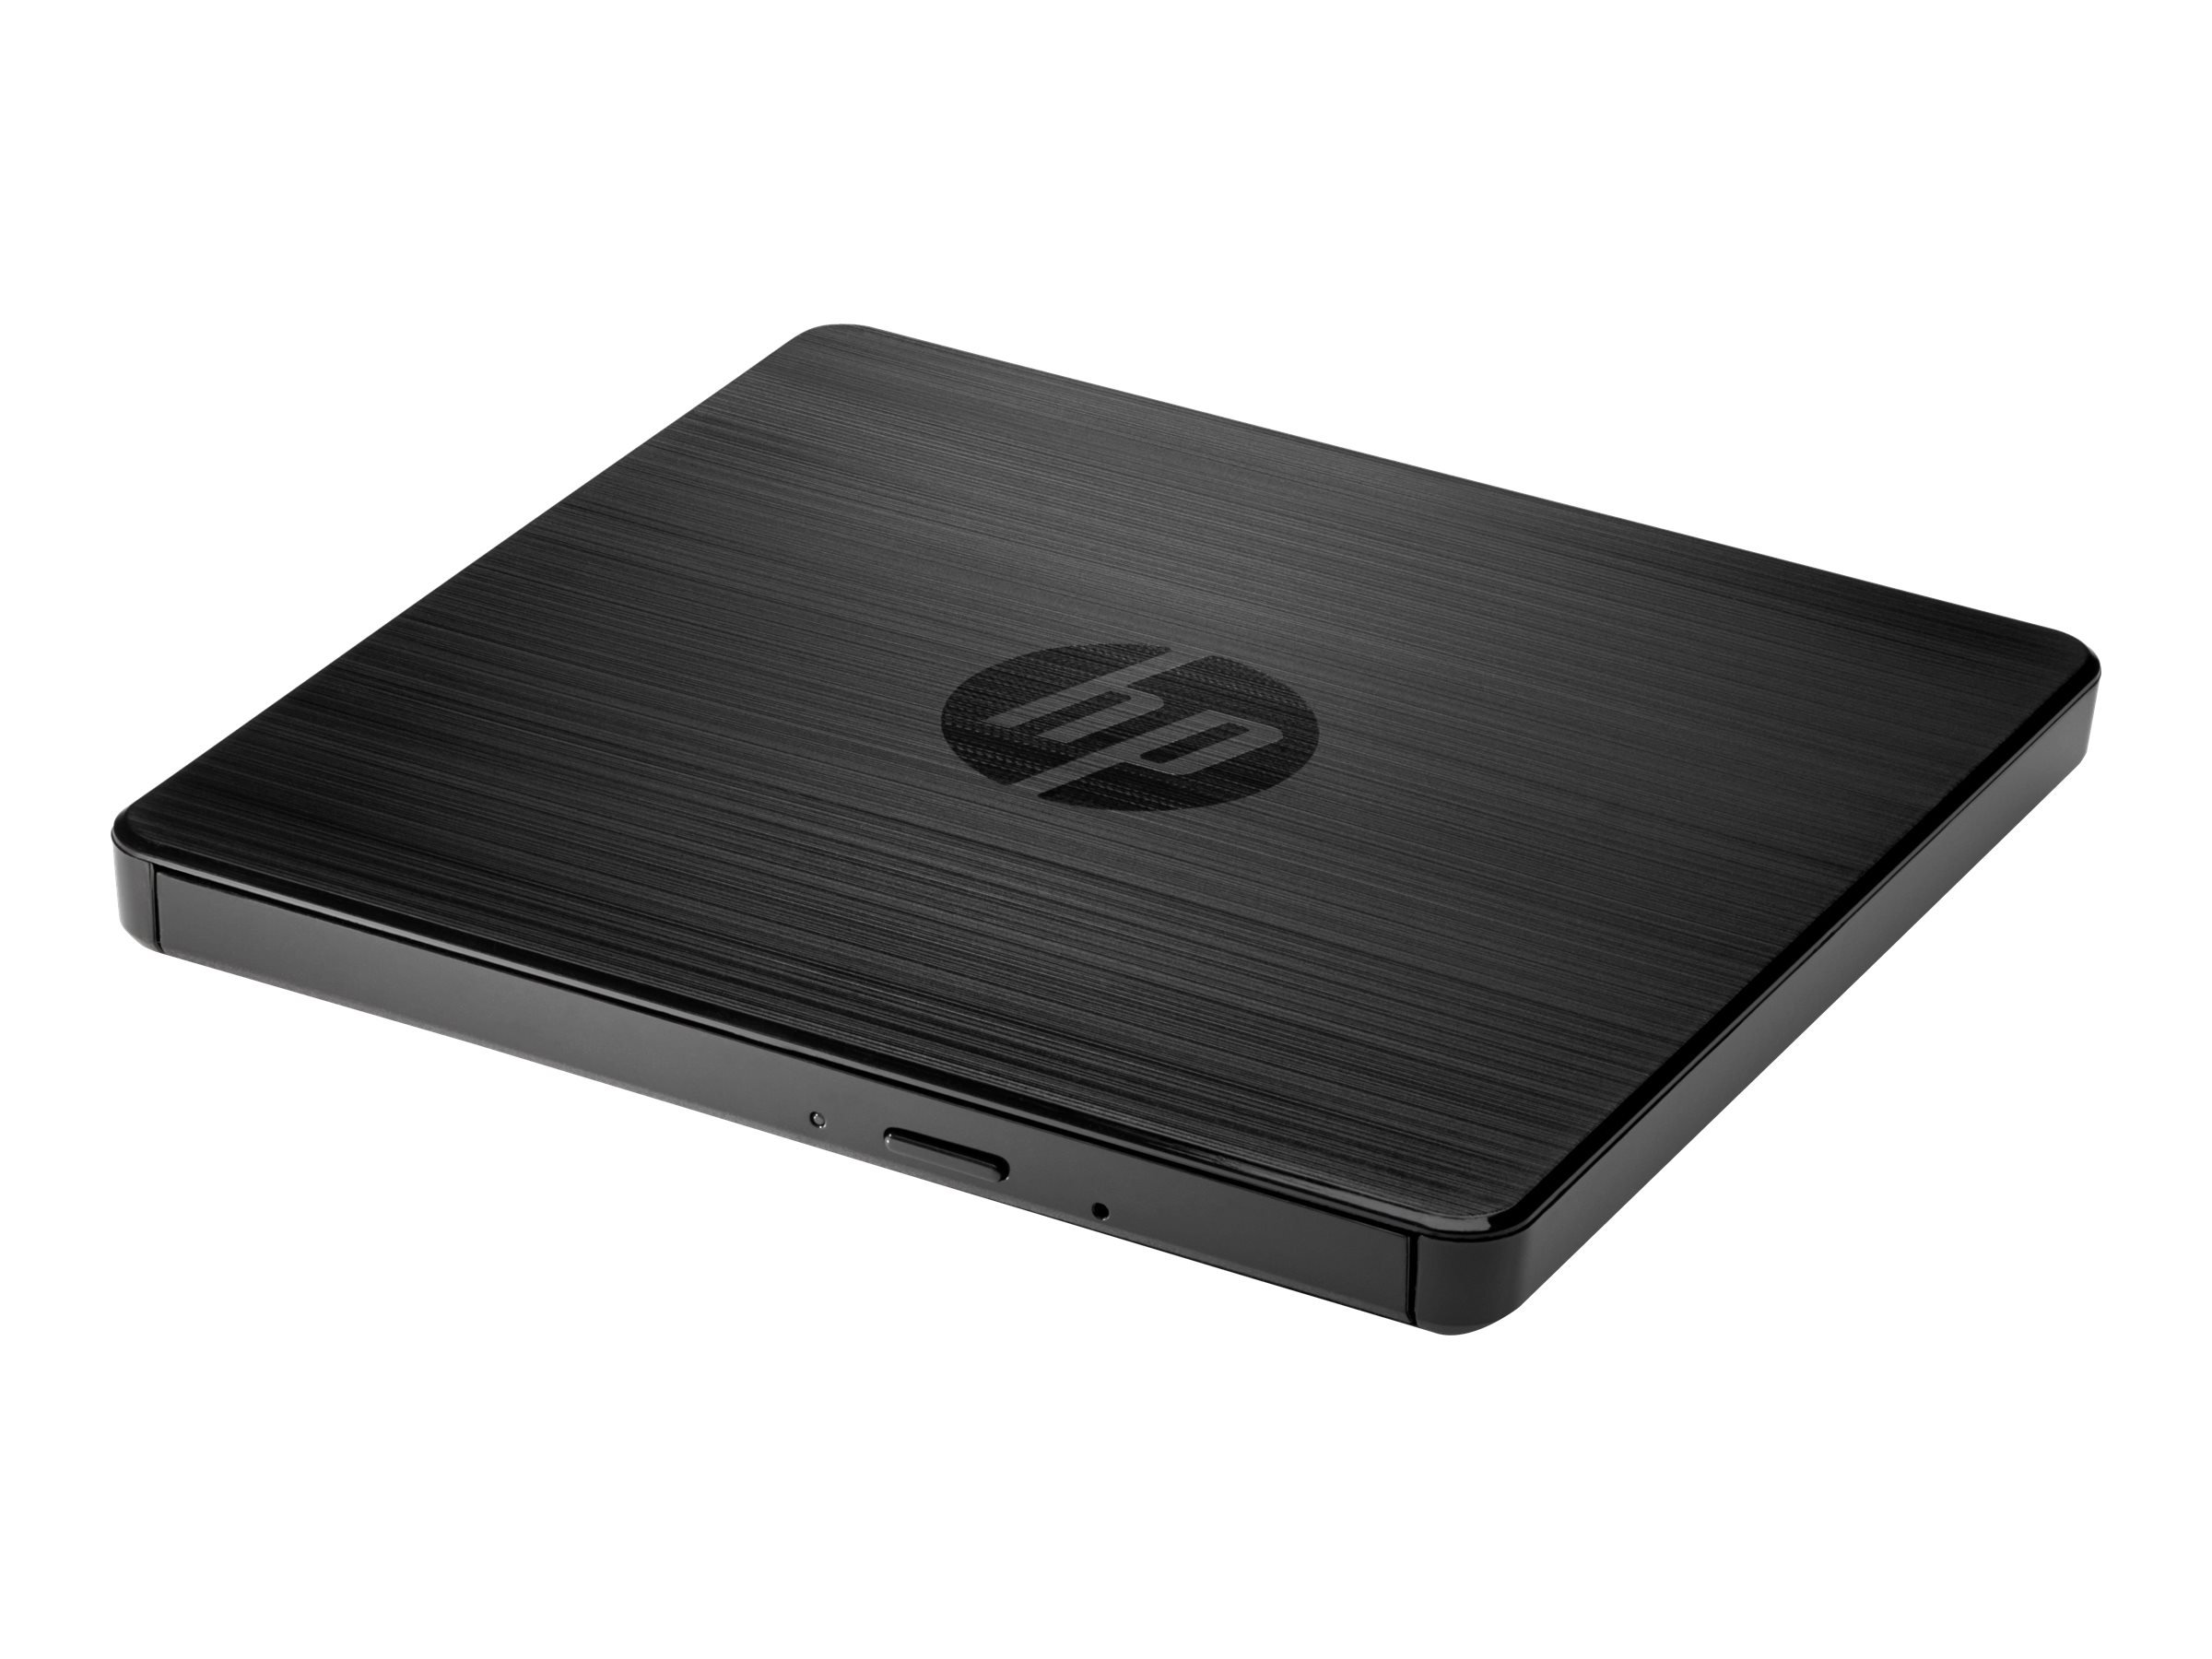 HP DVD-RW Drive - External Black (Y3T76AA)